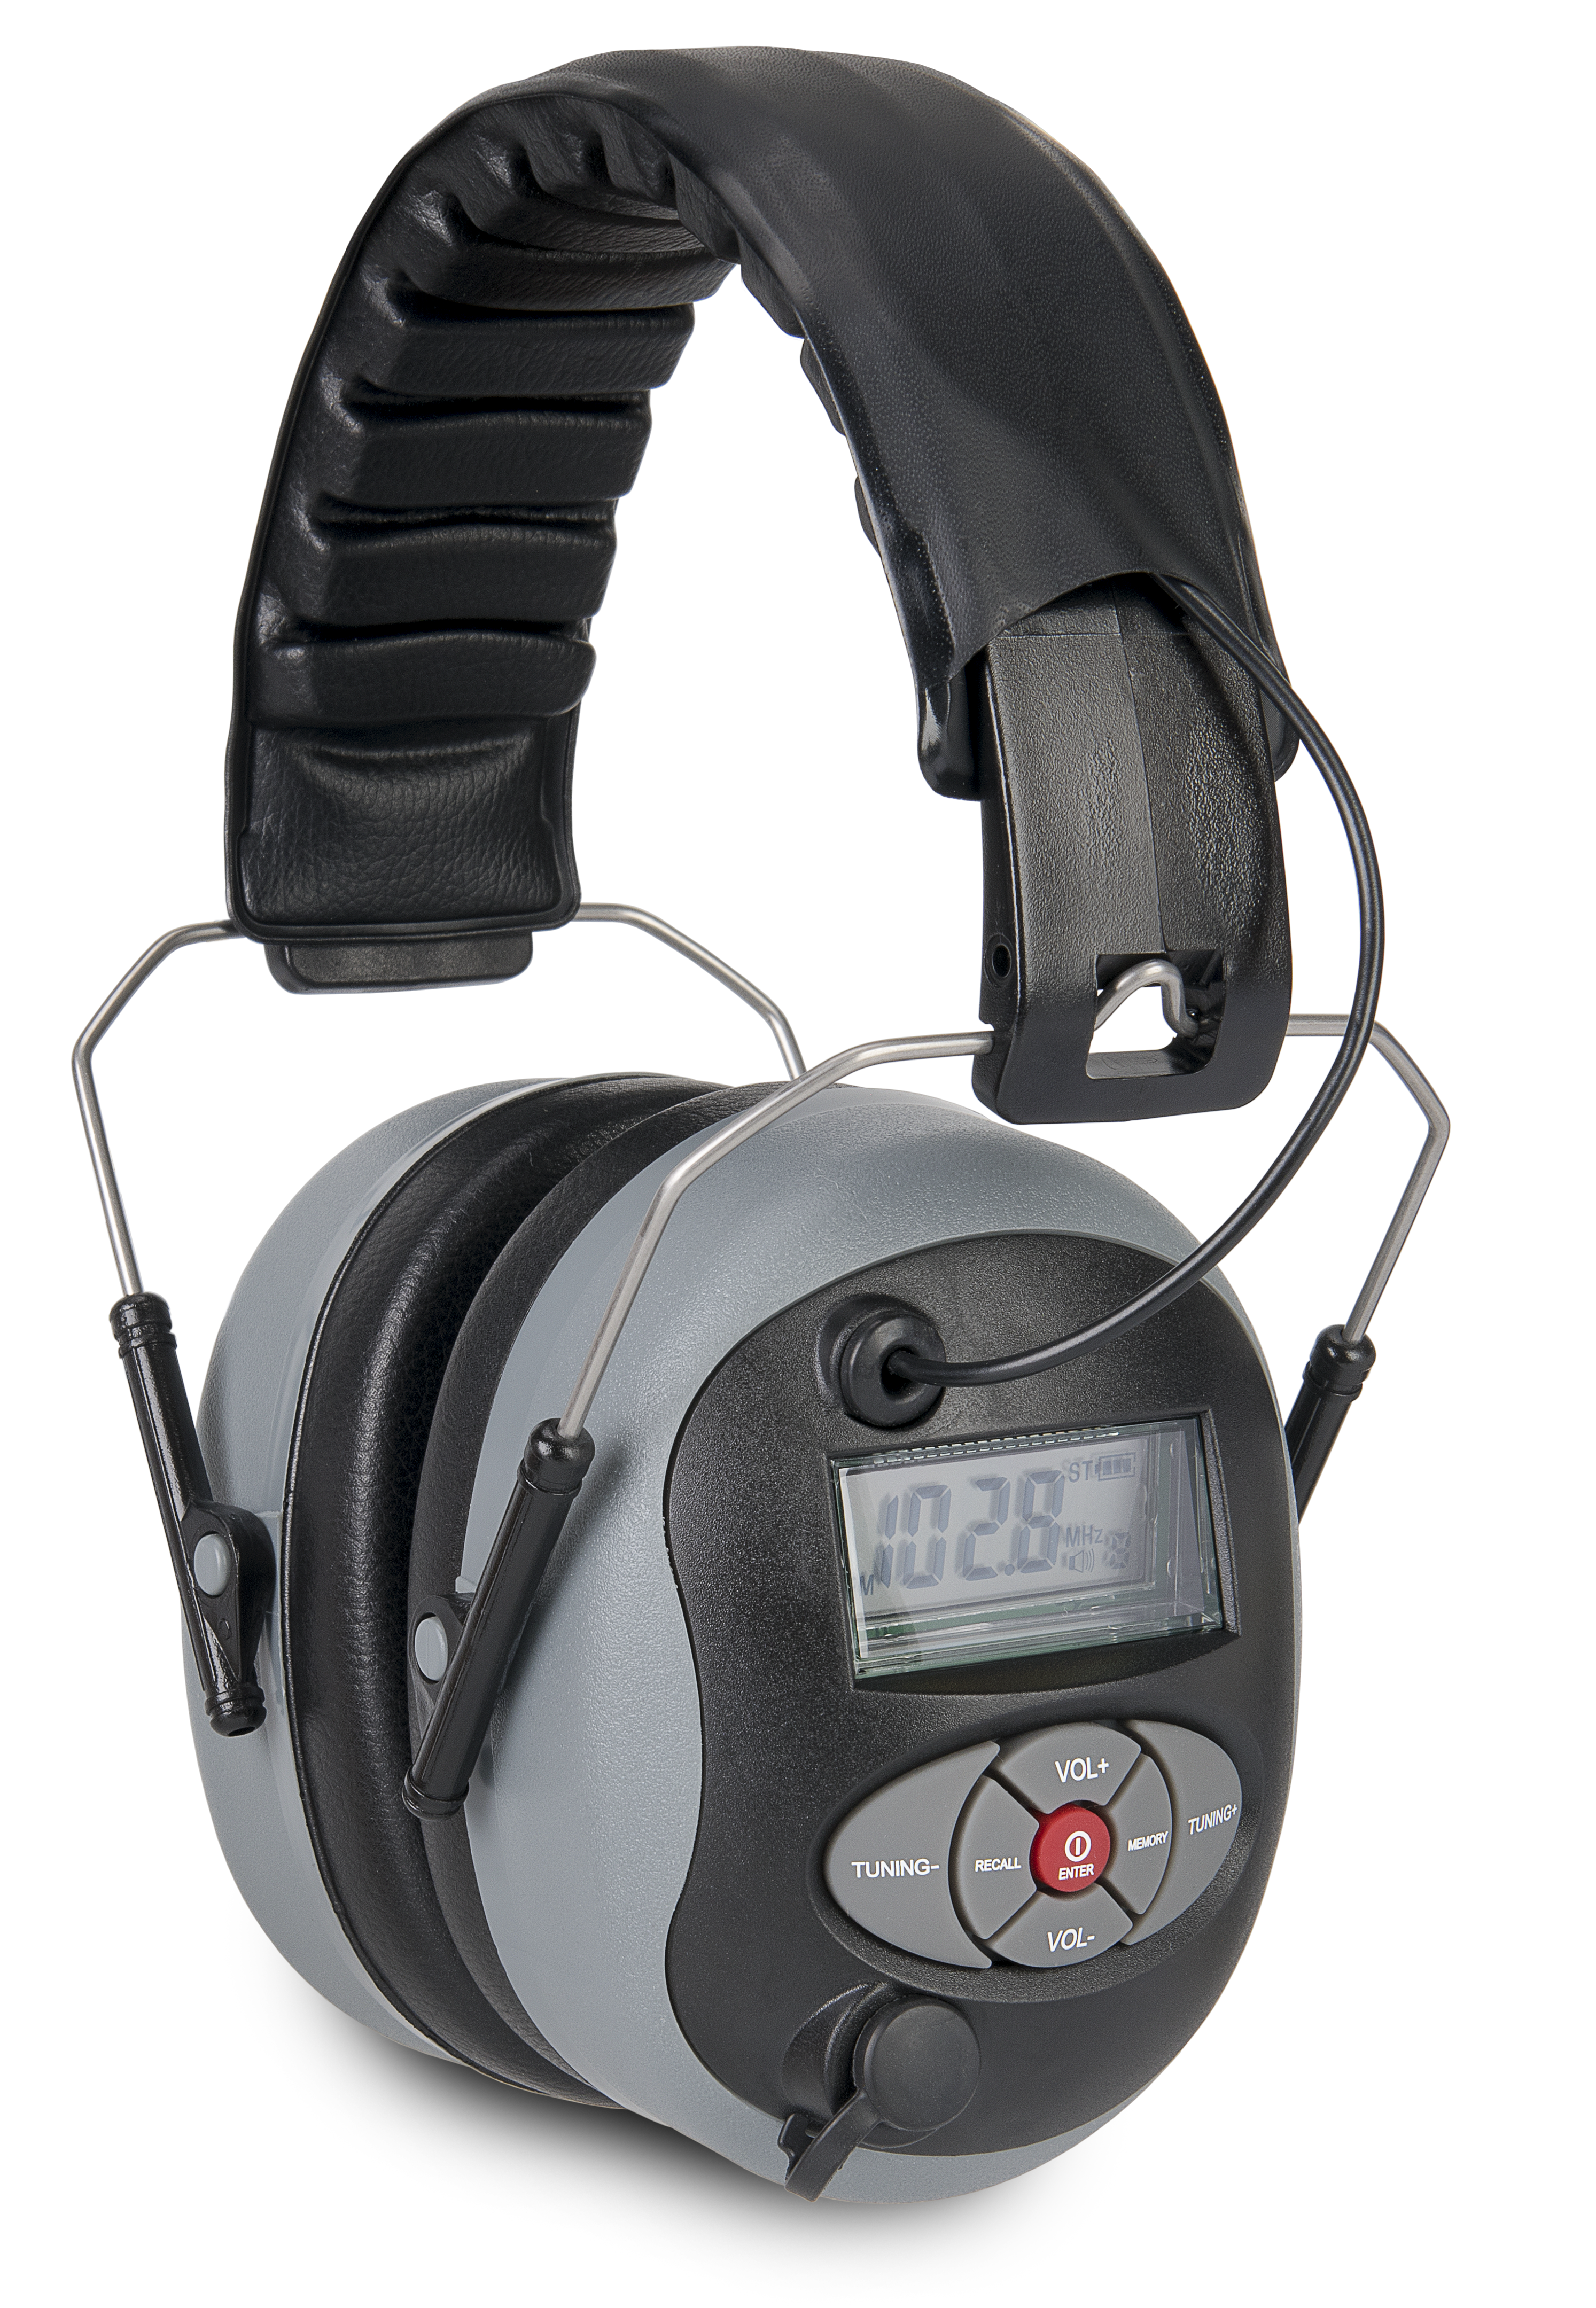 Artelli Pro-Silence FM oorkap productbeeld